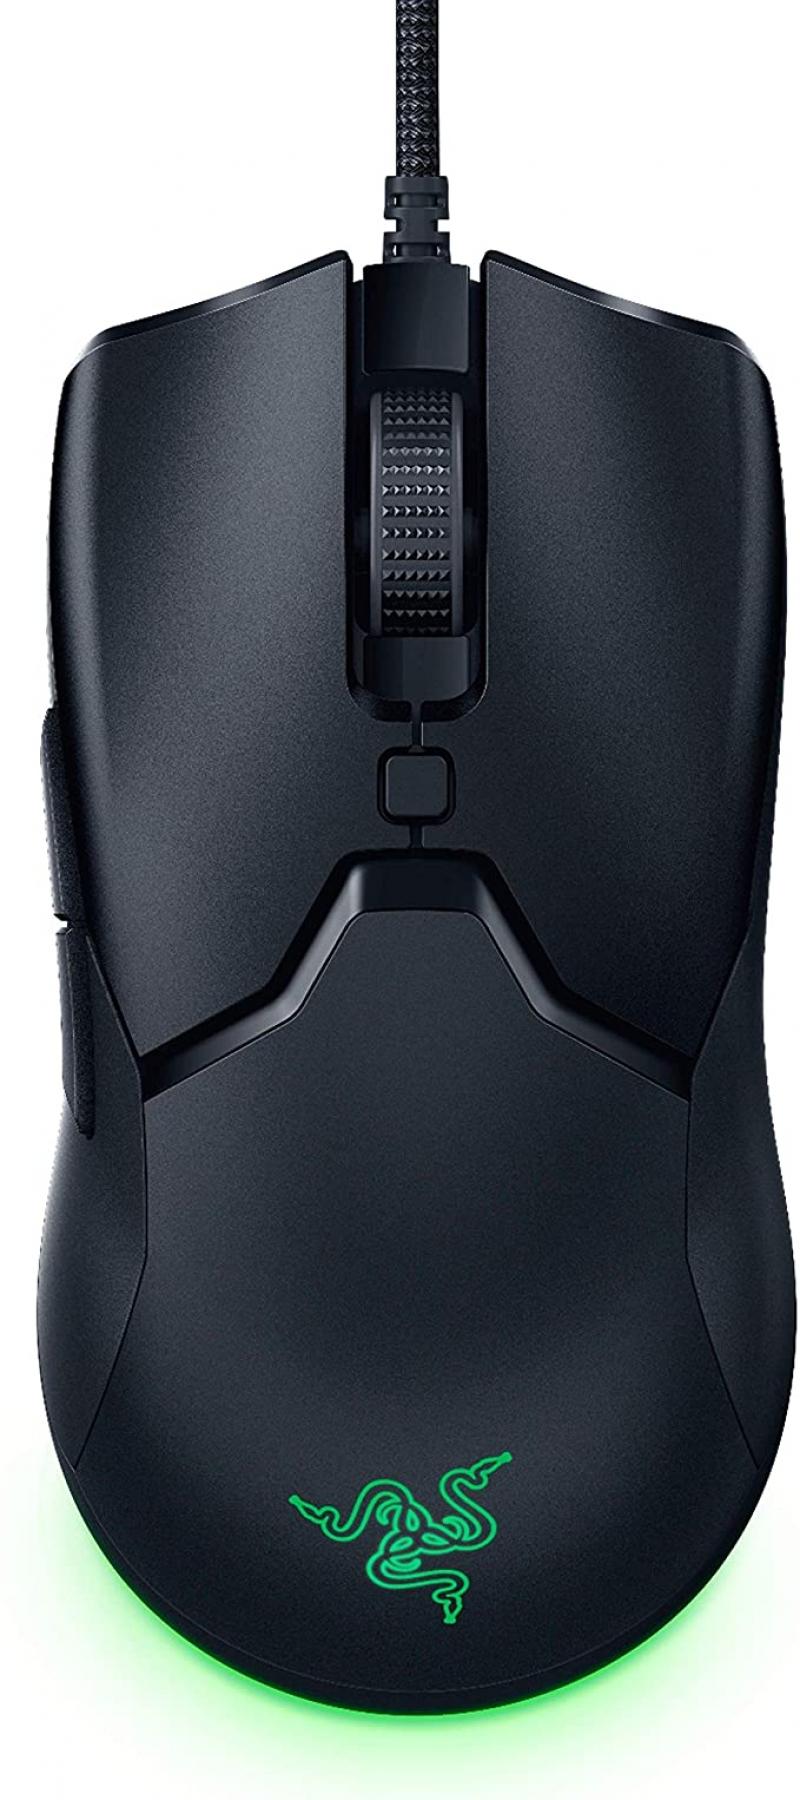 ihocon: Razer Viper Mini Ultralight Gaming Mouse 超輕超快遊戲滑鼠(有線)